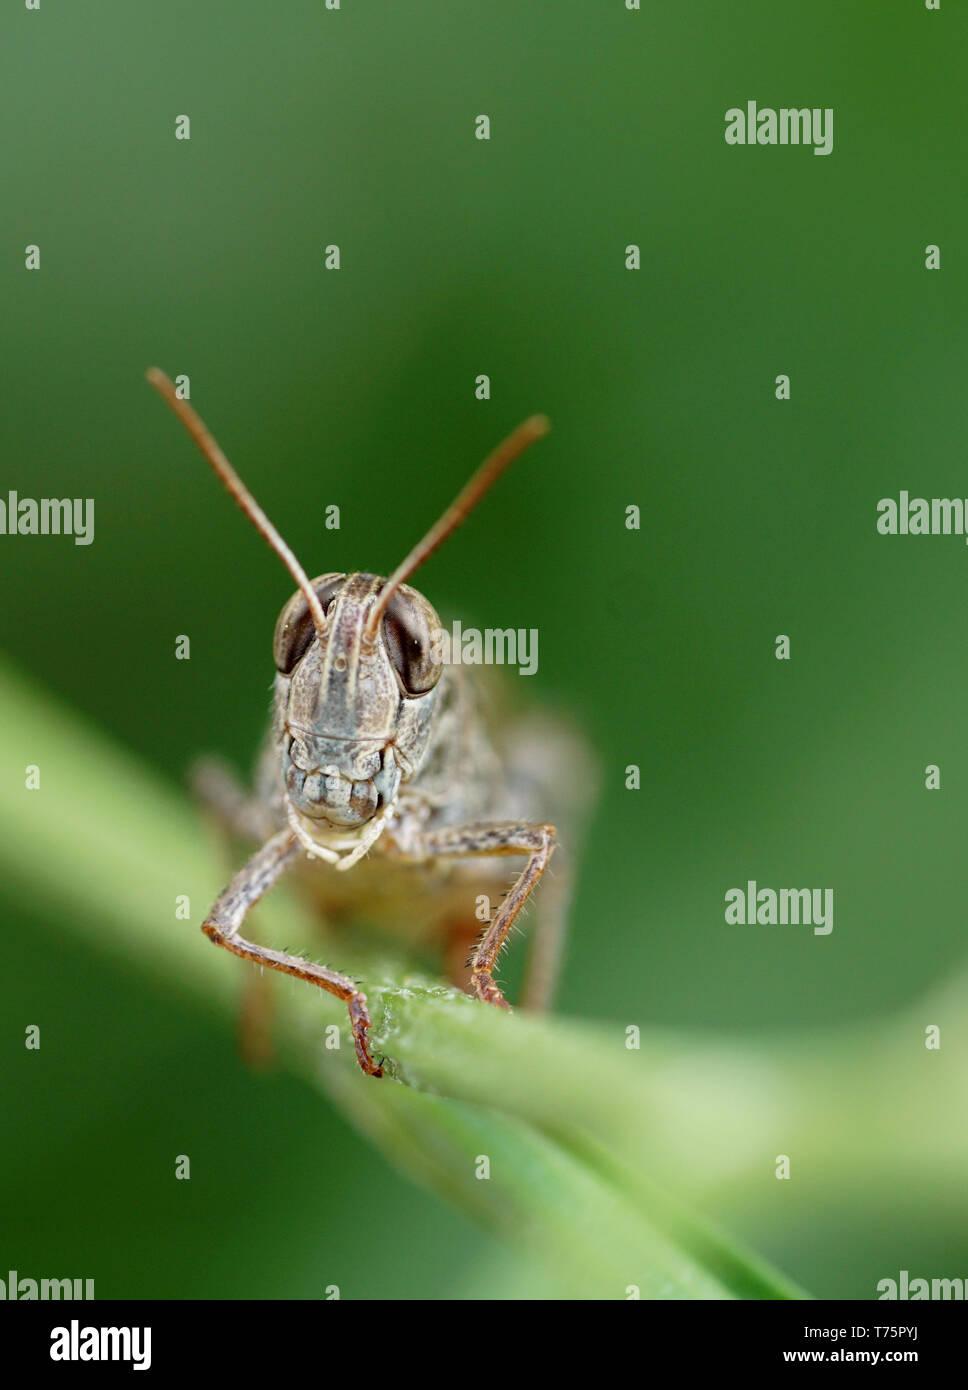 grasshopper - Heuschrecke - Stock Image